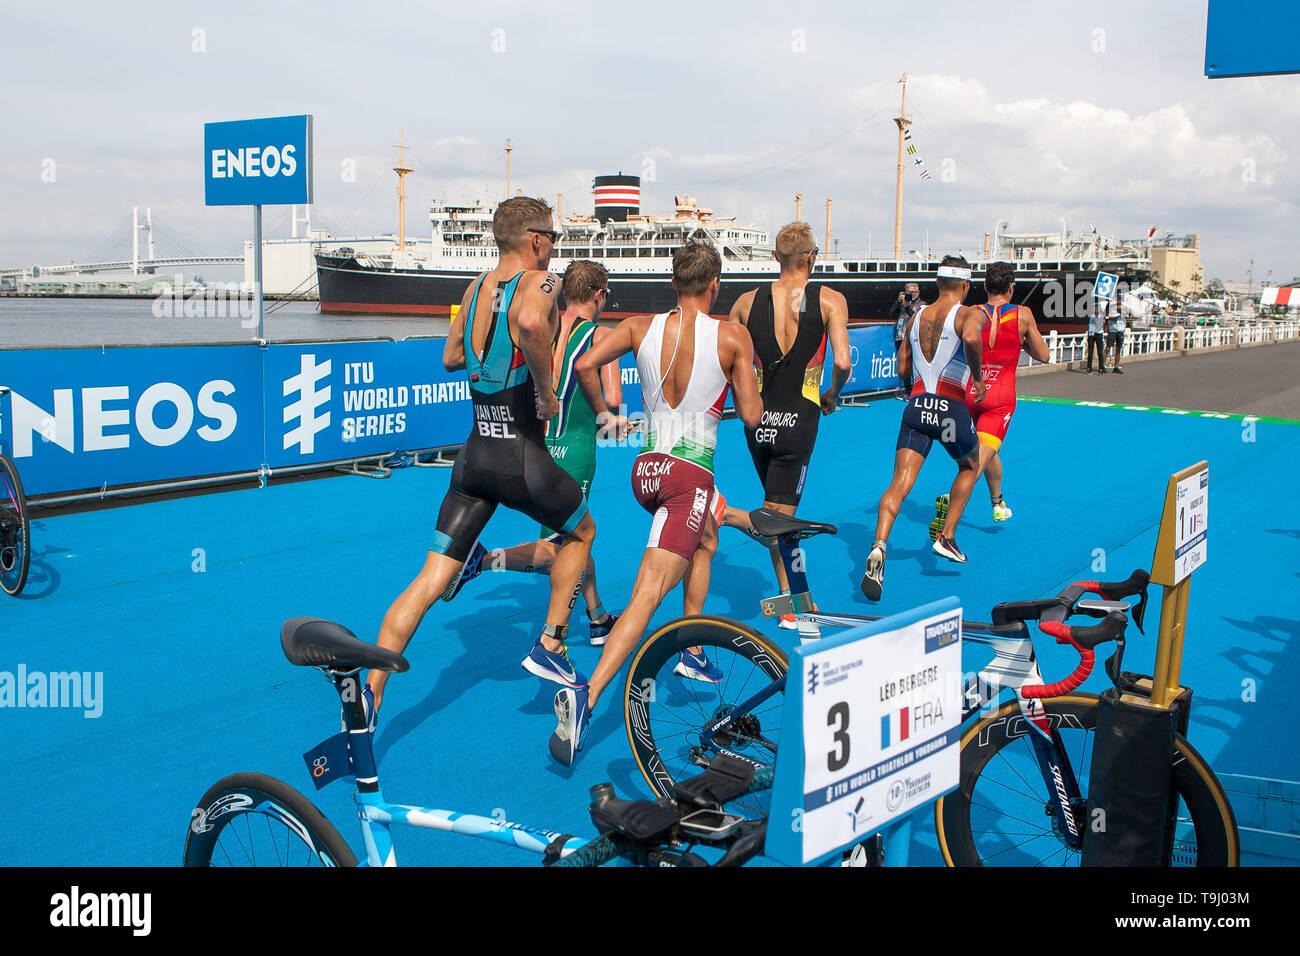 Yokohama, Japan. 18th May, 2019. 2019 ITU World Triathlon, World Paratriathlon Yokohama at Yamashita Park and Minato Mirai, Yokohama. (Photos by Michael Steinebach/AFLO) Credit: Aflo Co. Ltd./Alamy Live News Stock Photo